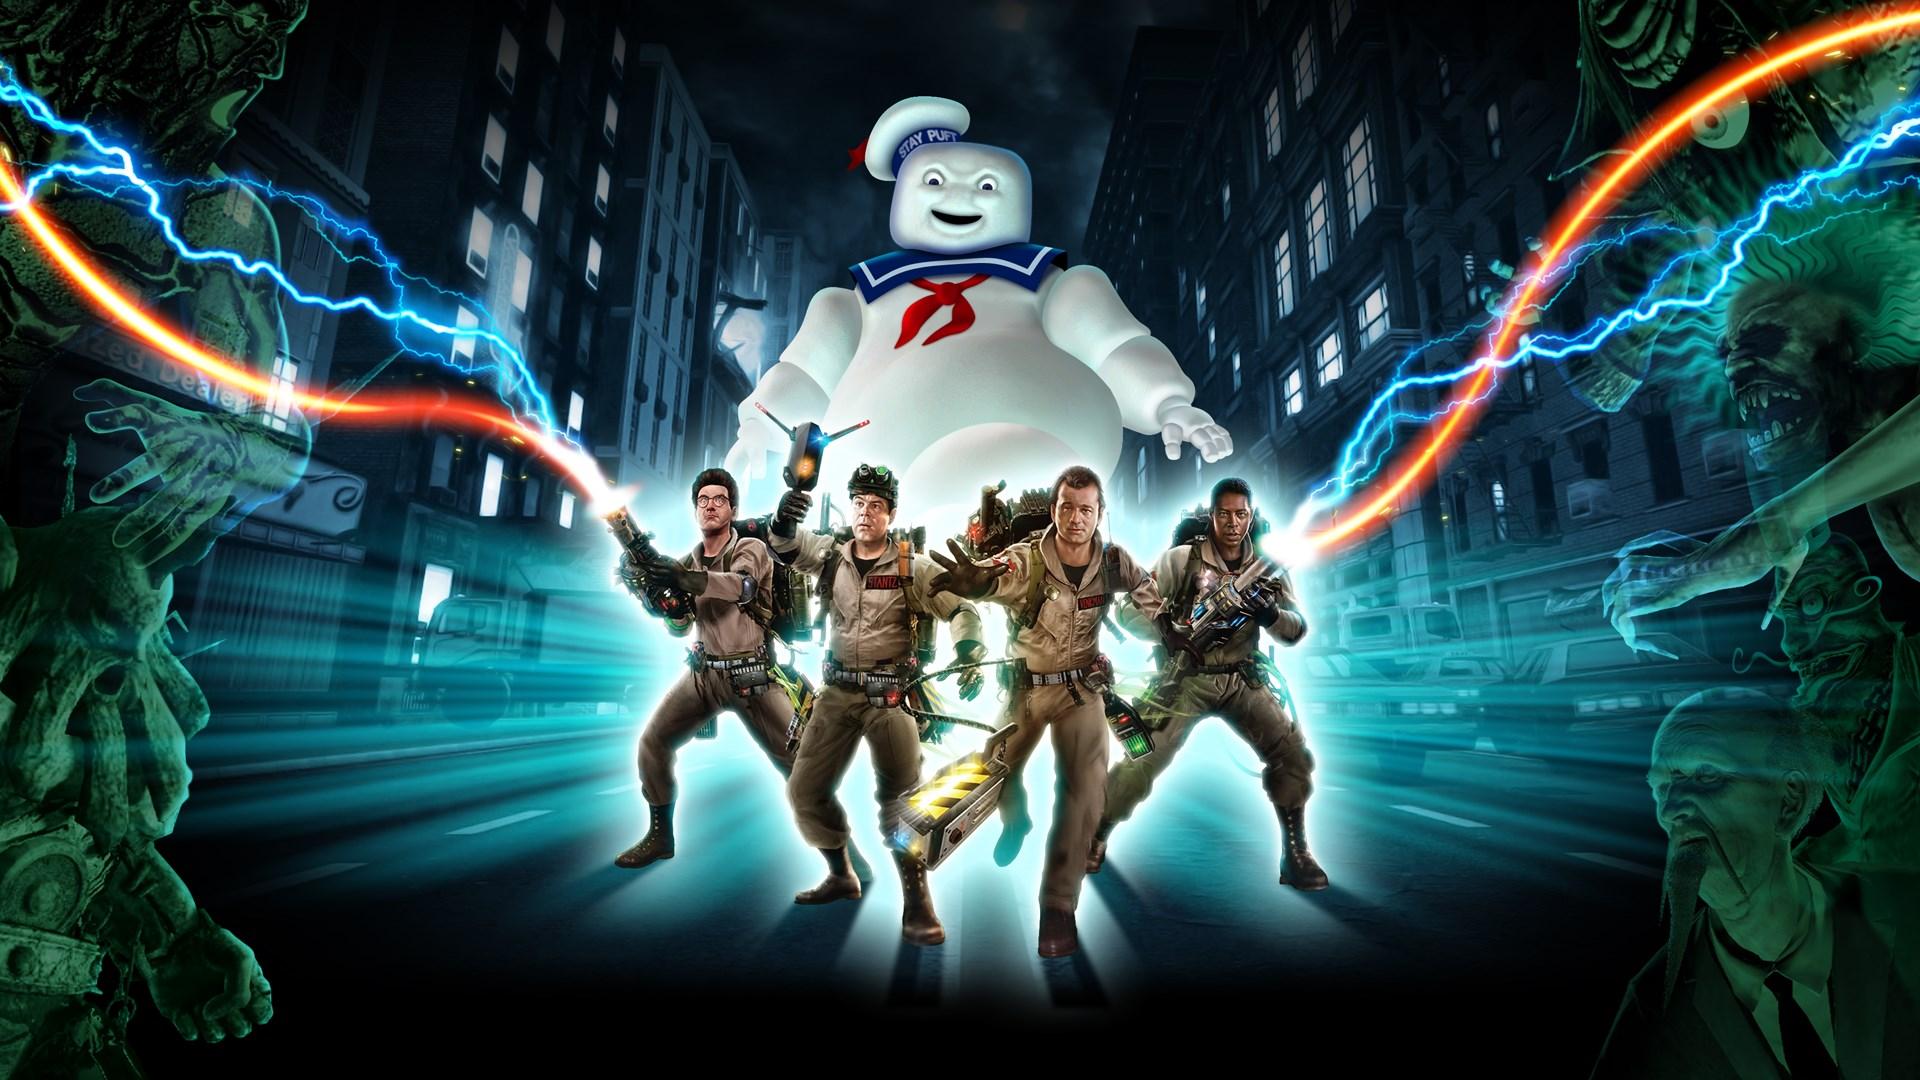 Ремастер Ghostbusters: The Video Game стал бесплатным в EGS / фото microsoft.com